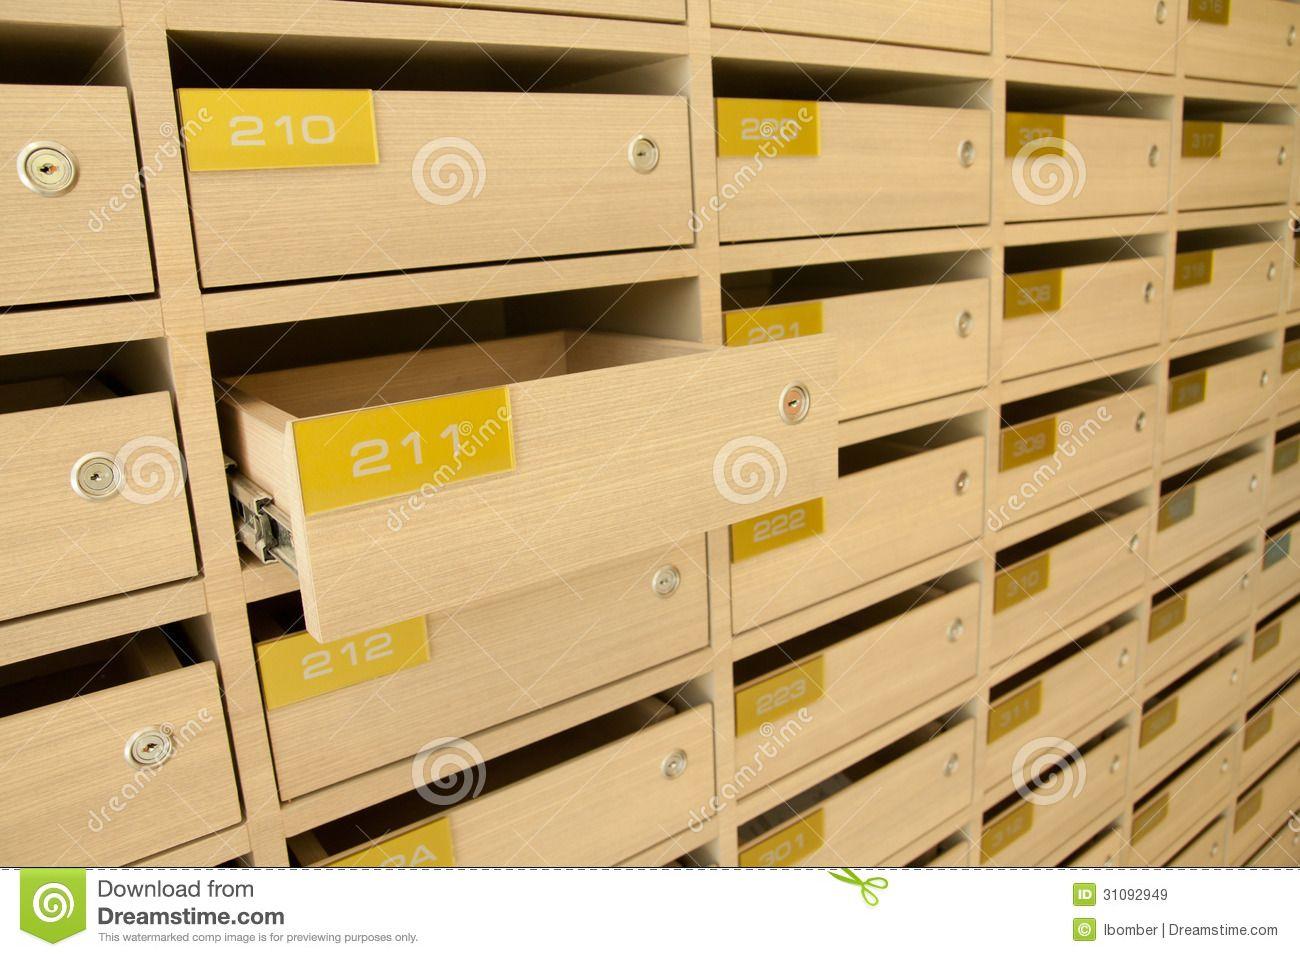 Modern Wooden Mailbox Apartment Panel Condominium Residential Place 31092949 Jpg 1300 957 Wooden Mailbox Mailbox Mail Room